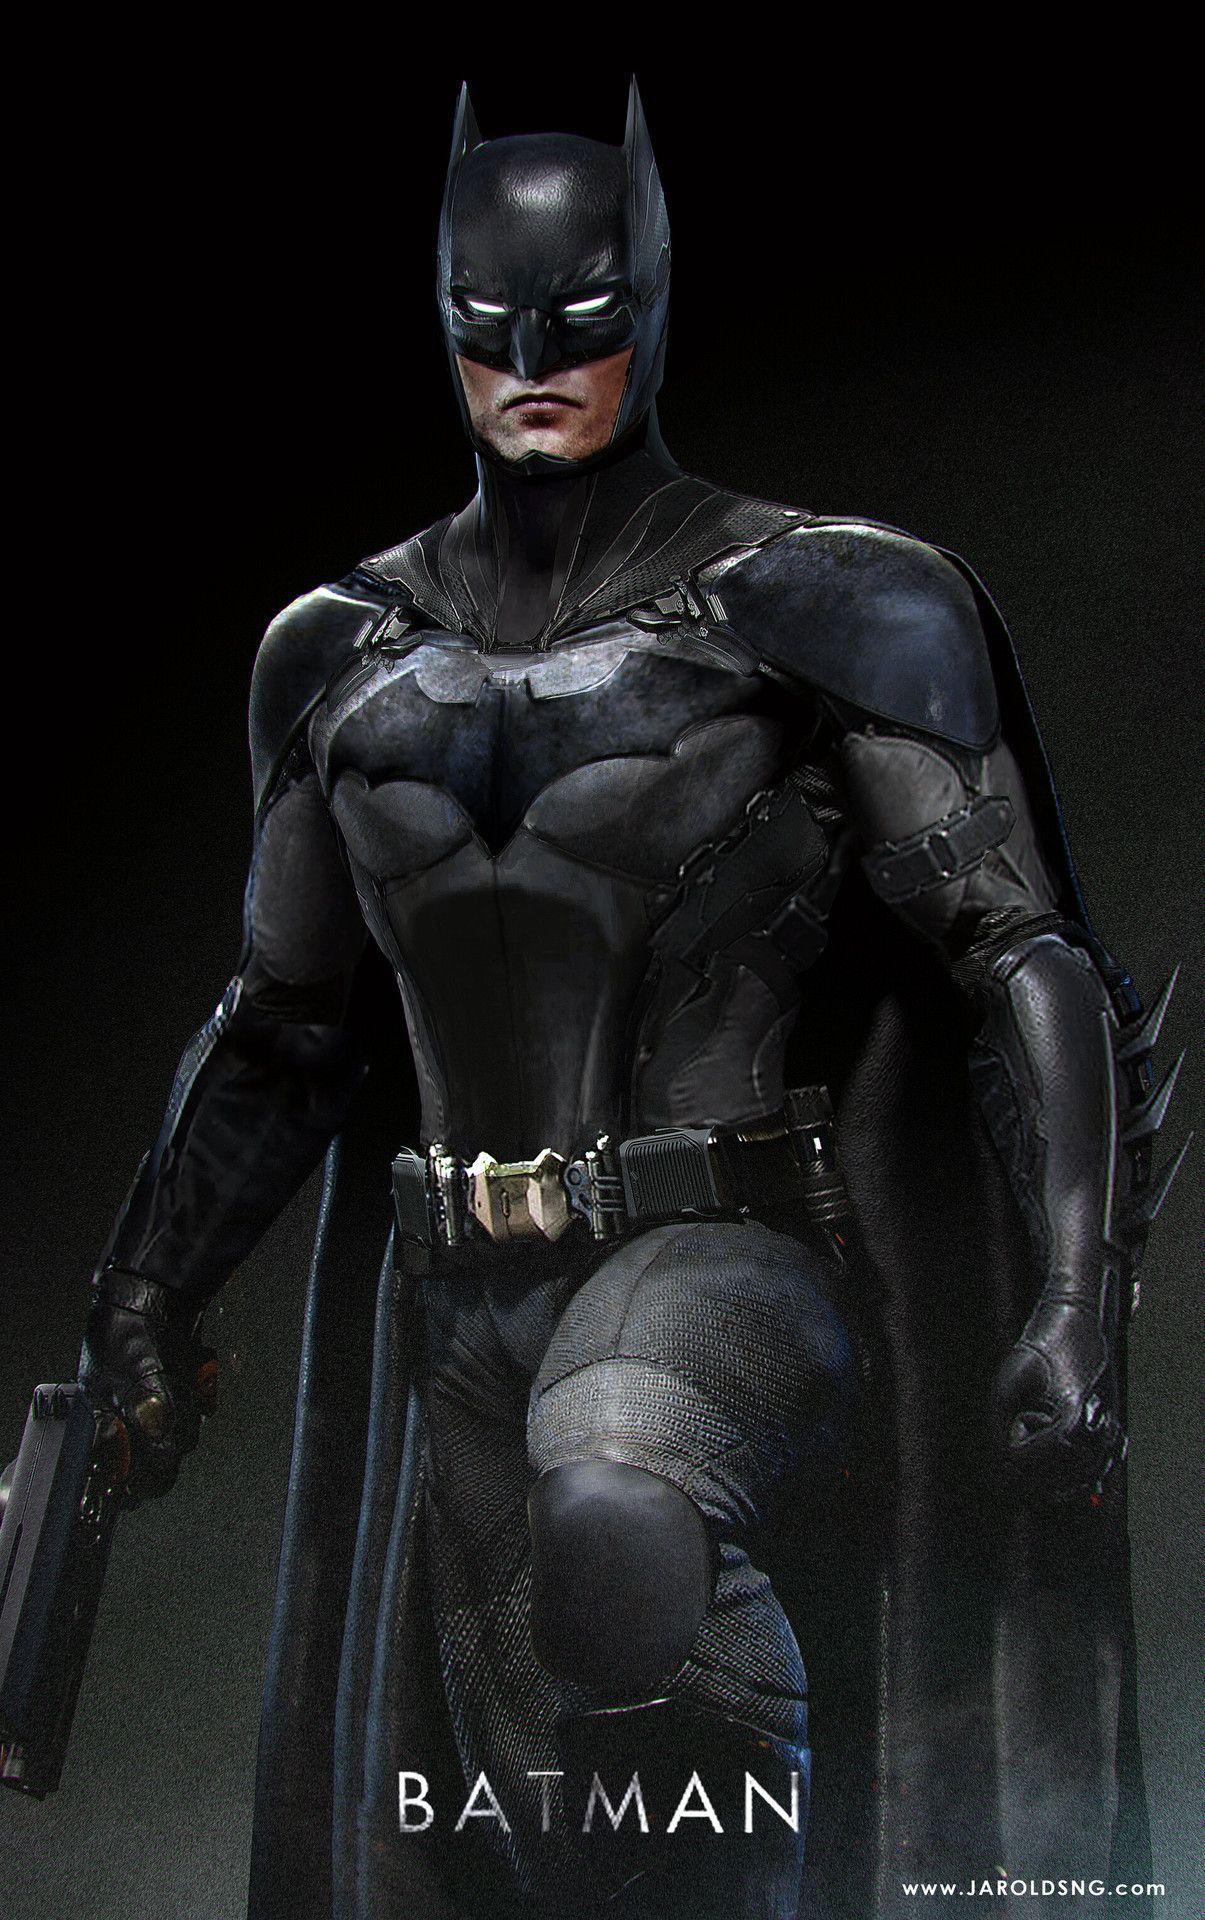 Batman Concept Art Robert Pattinson in costume by Jarod